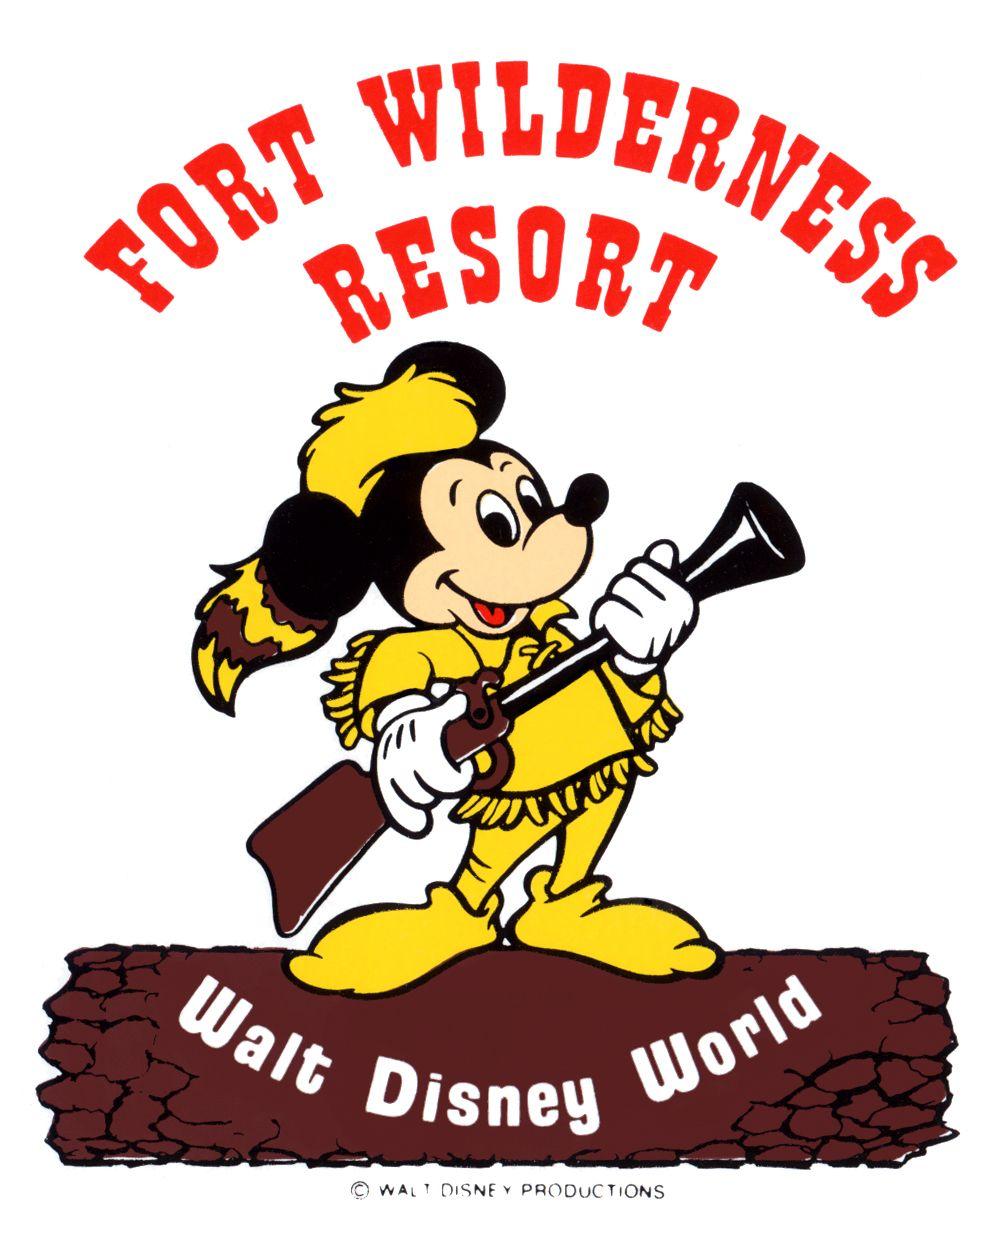 fort wilderness resort mickey mouse dressed as davy crockett